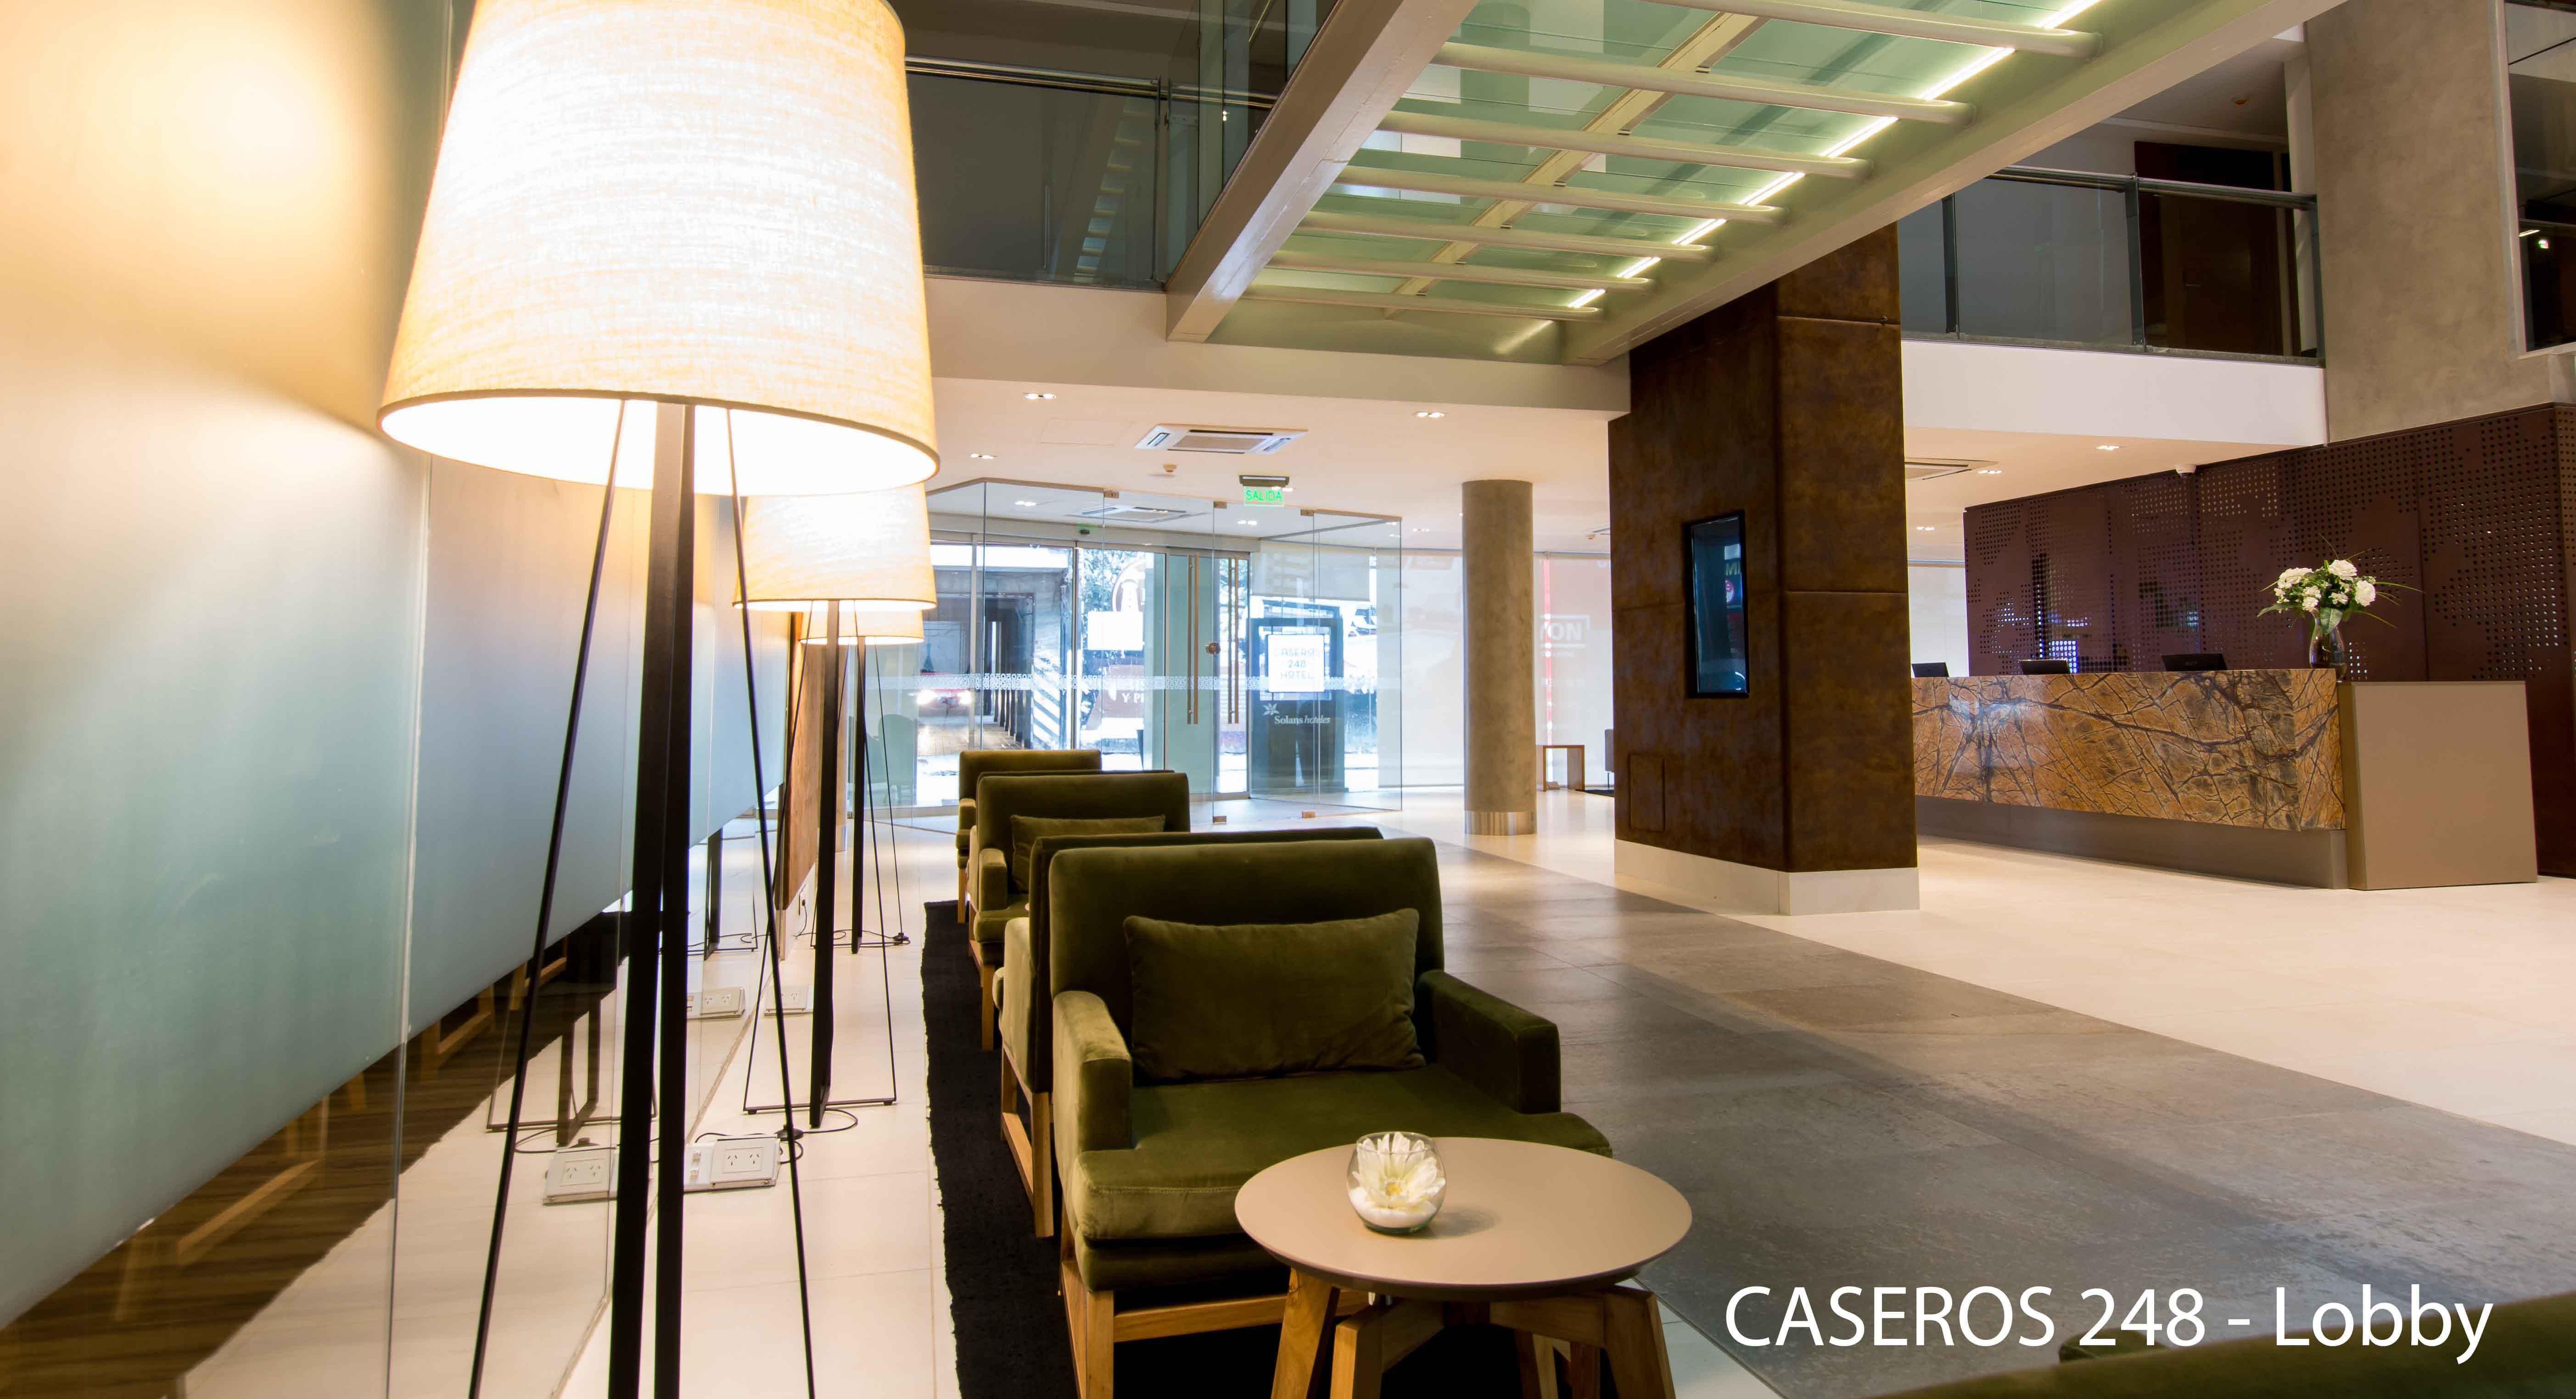 Caseros 248 Hotel- Solans